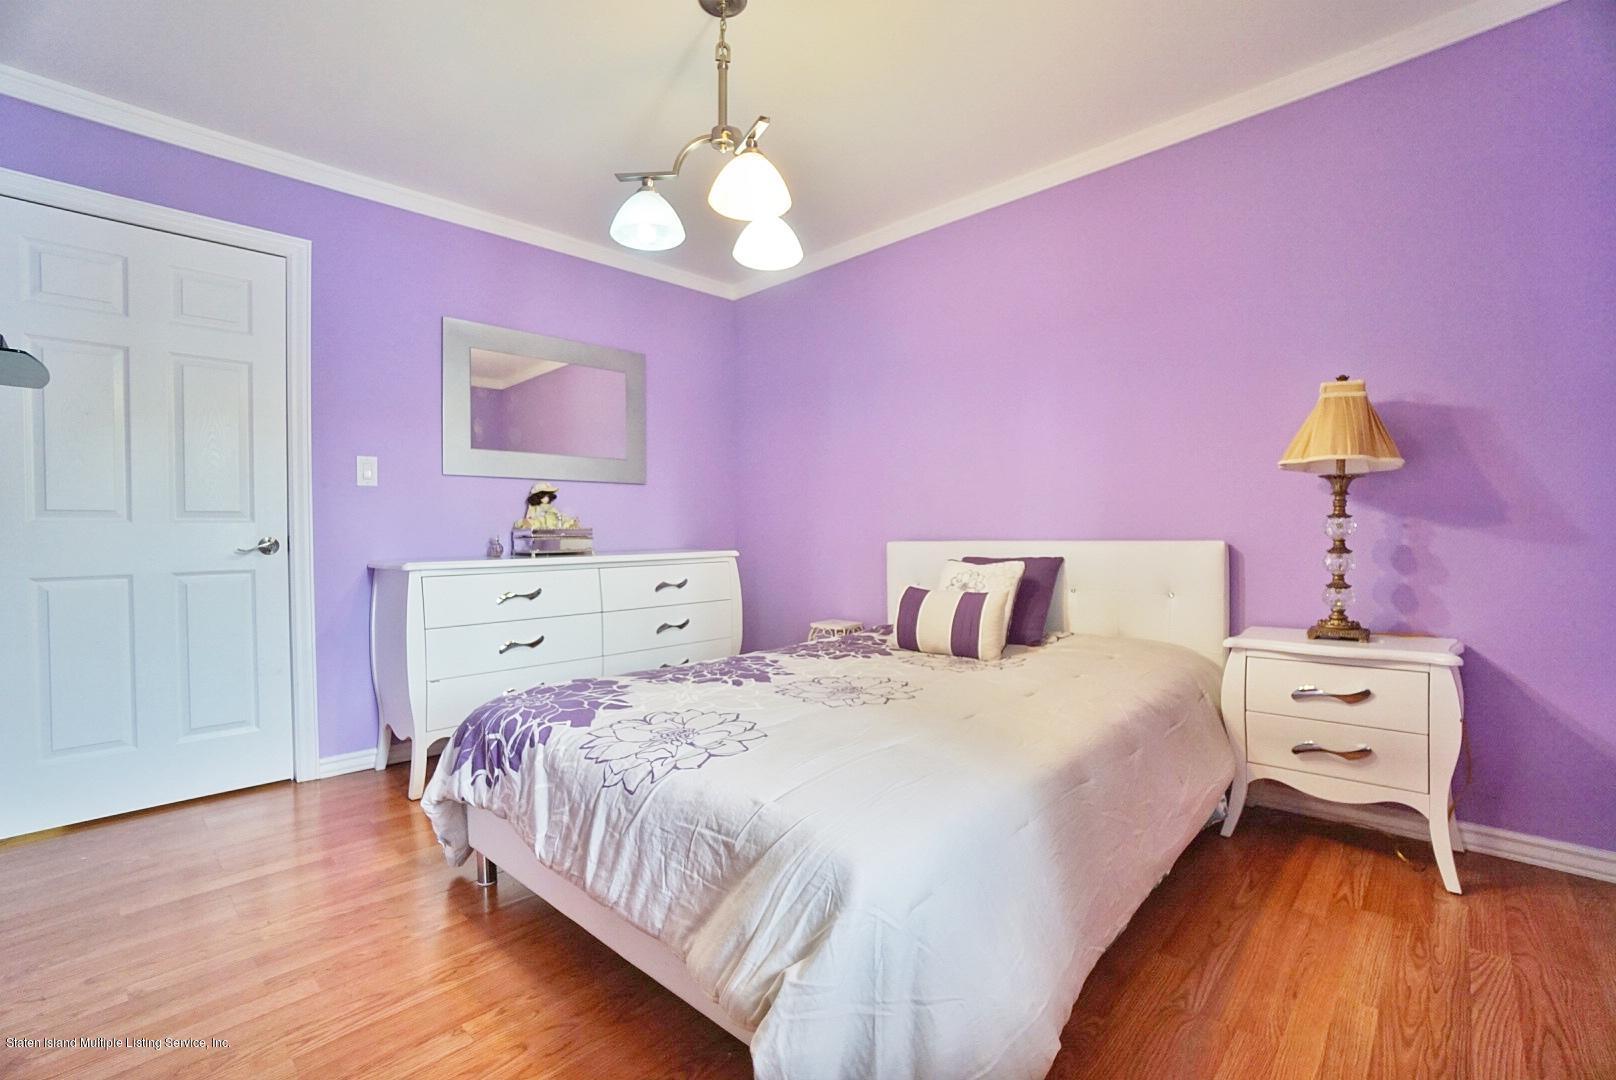 Single Family - Detached 67 Marvin Road  Staten Island, NY 10309, MLS-1128691-17